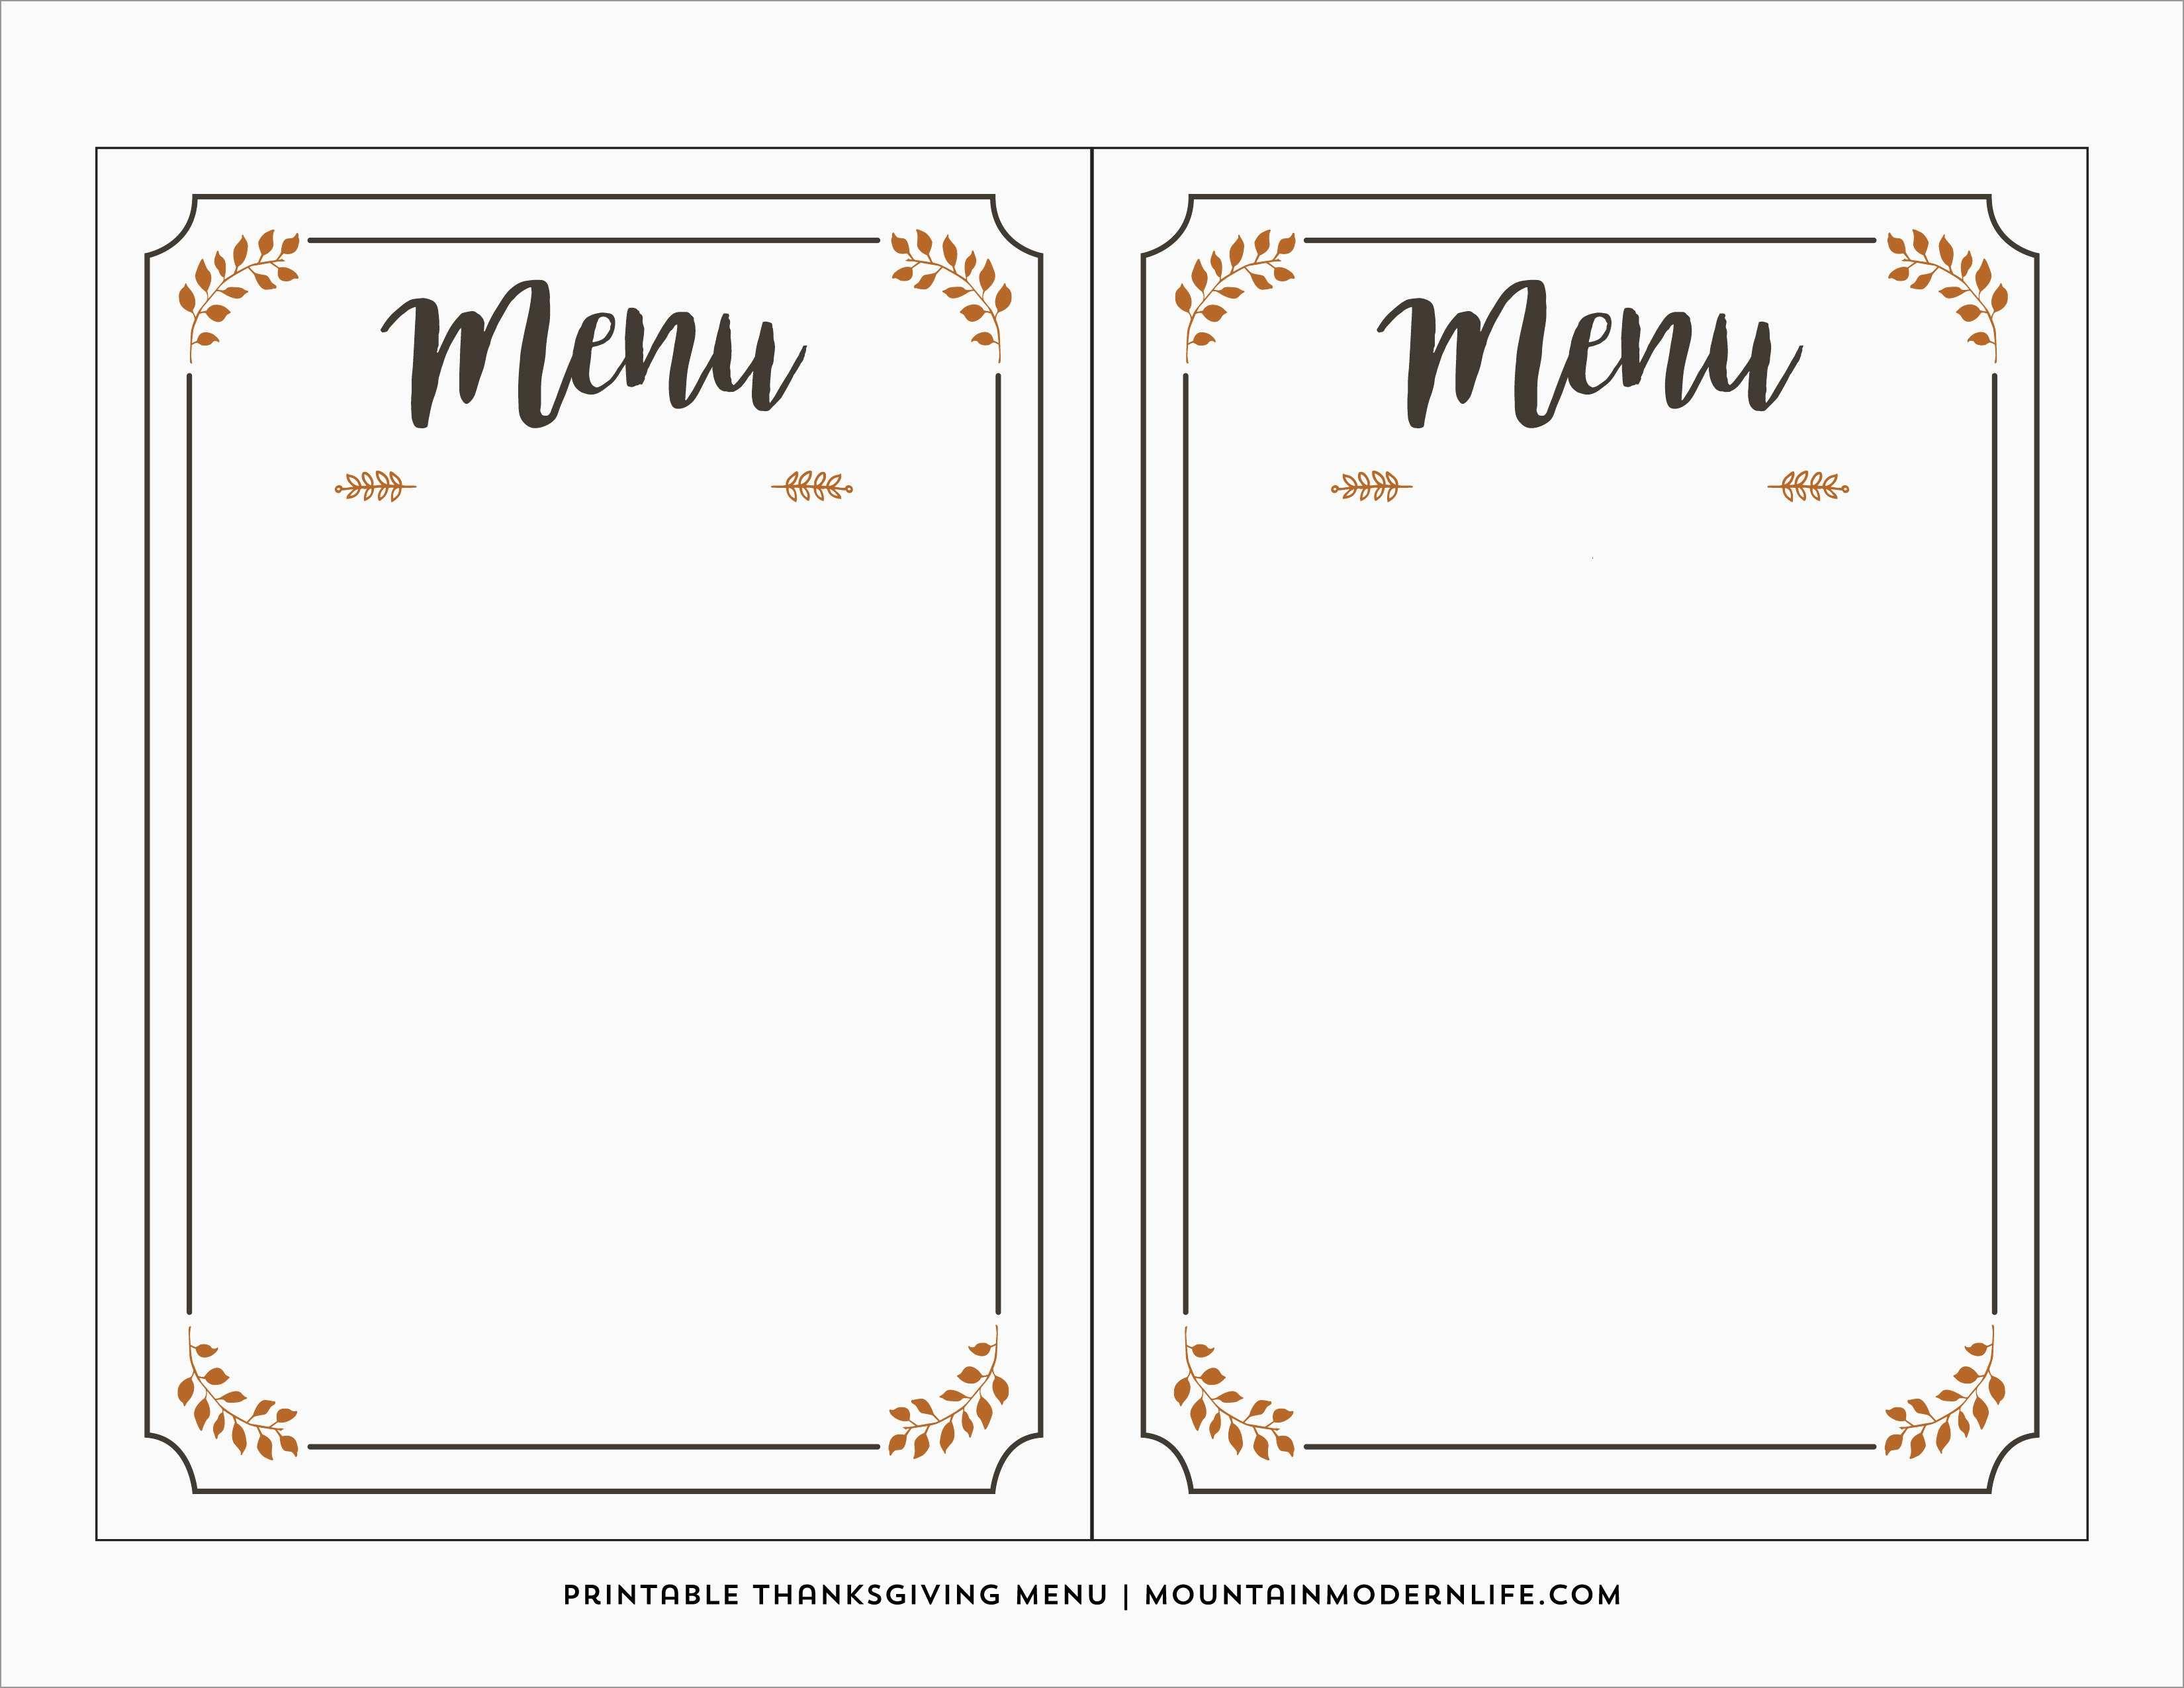 Free Printable Food Menu Templates New Menu Template Word | Best Of - Free Printable Menu Templates Word